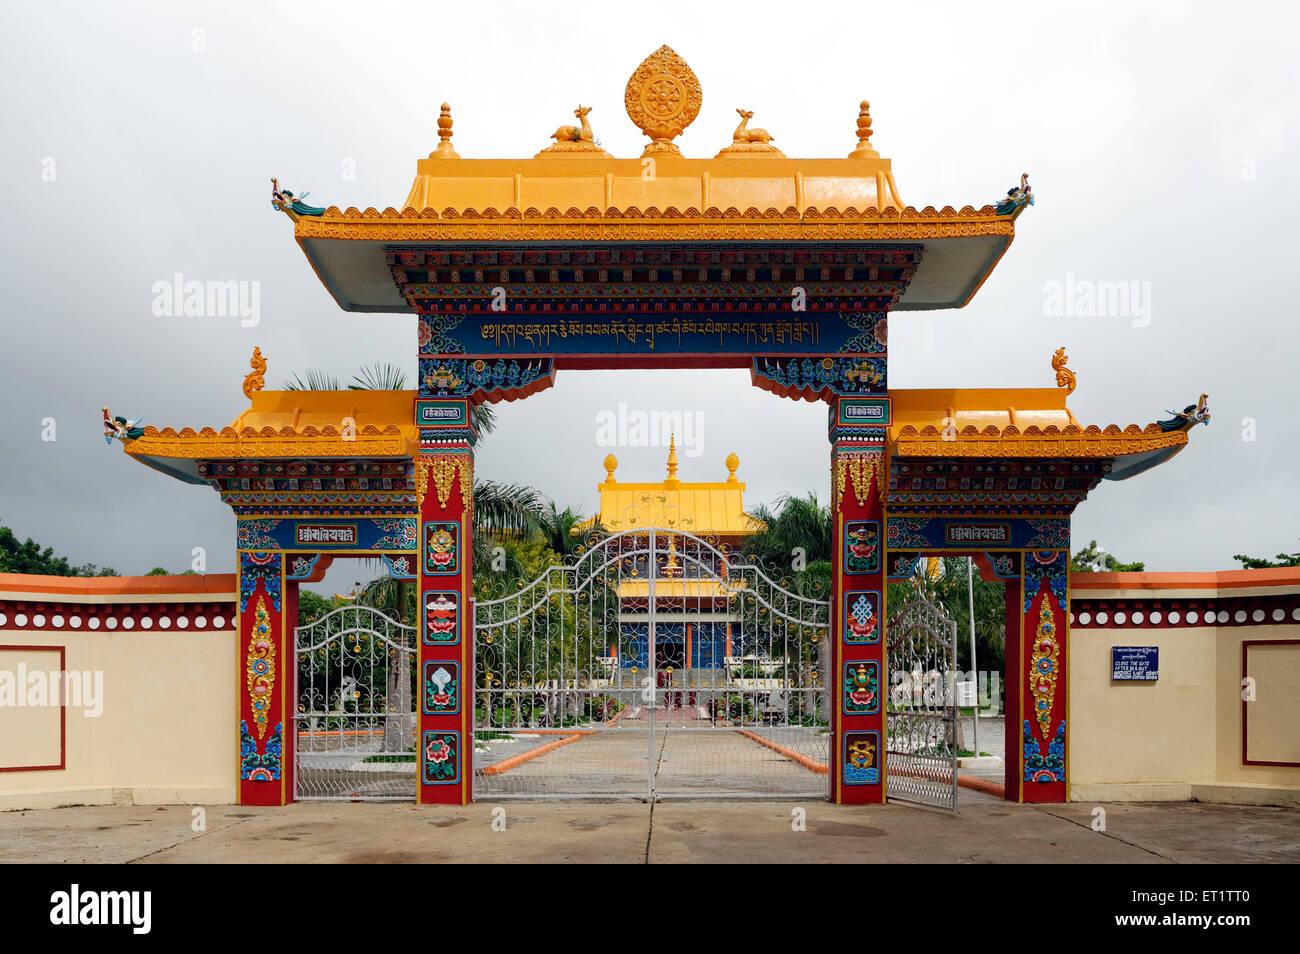 Entrance of Shar Gaden Monastery at Mundgod Karnataka India Asia - Stock Image